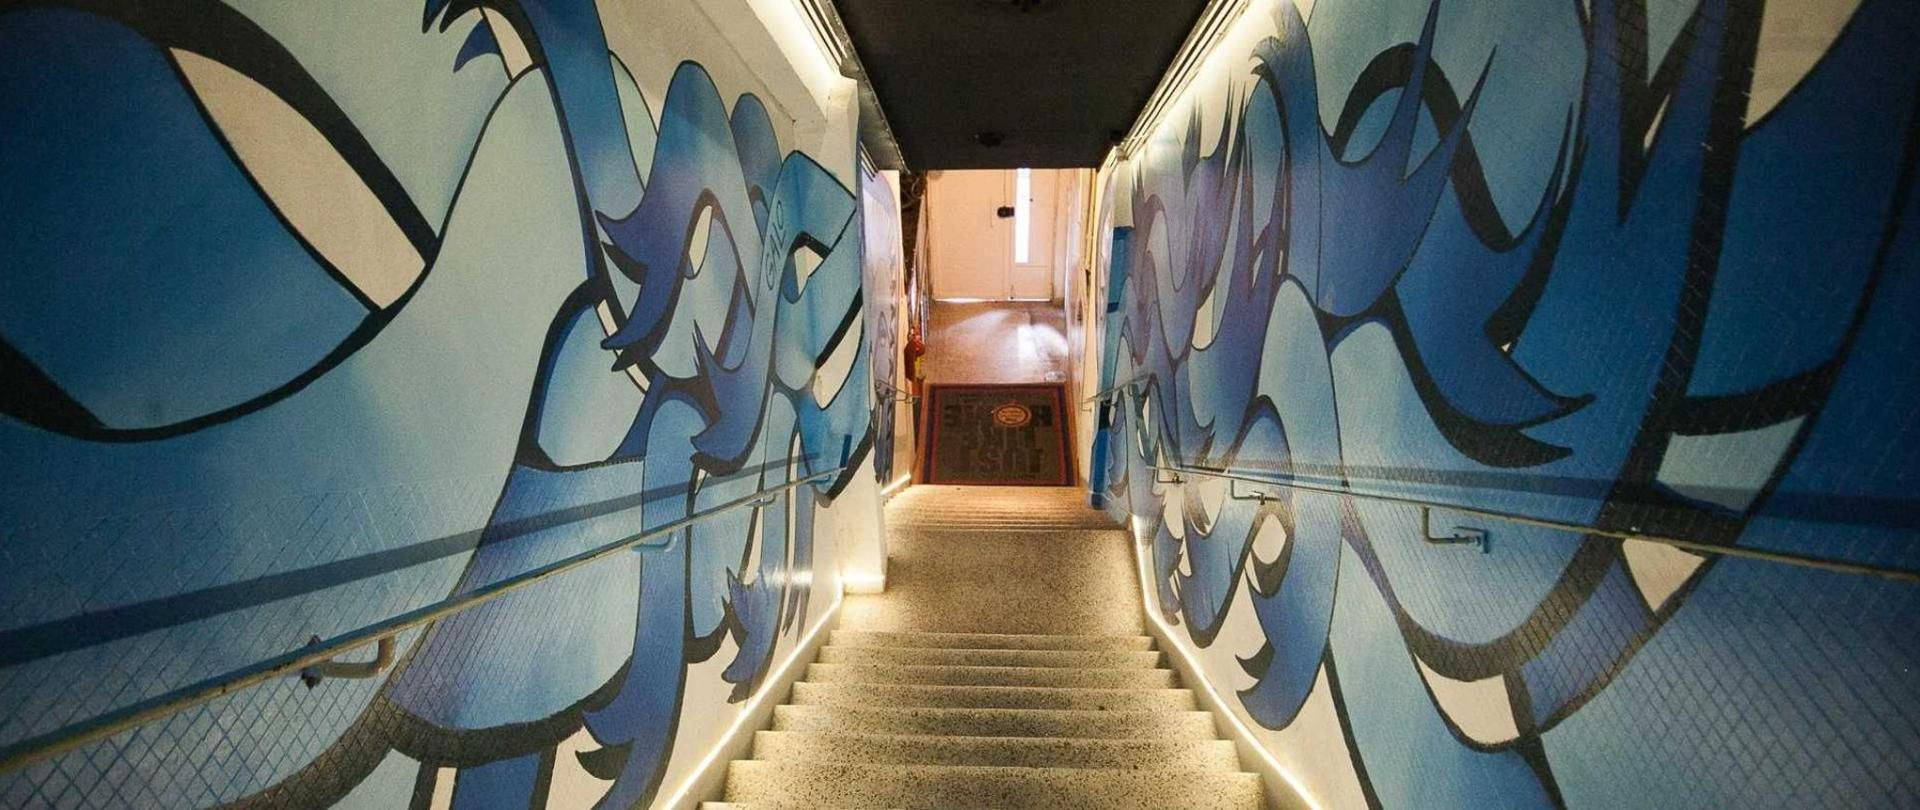 Hostel pauliste SP5.jpg